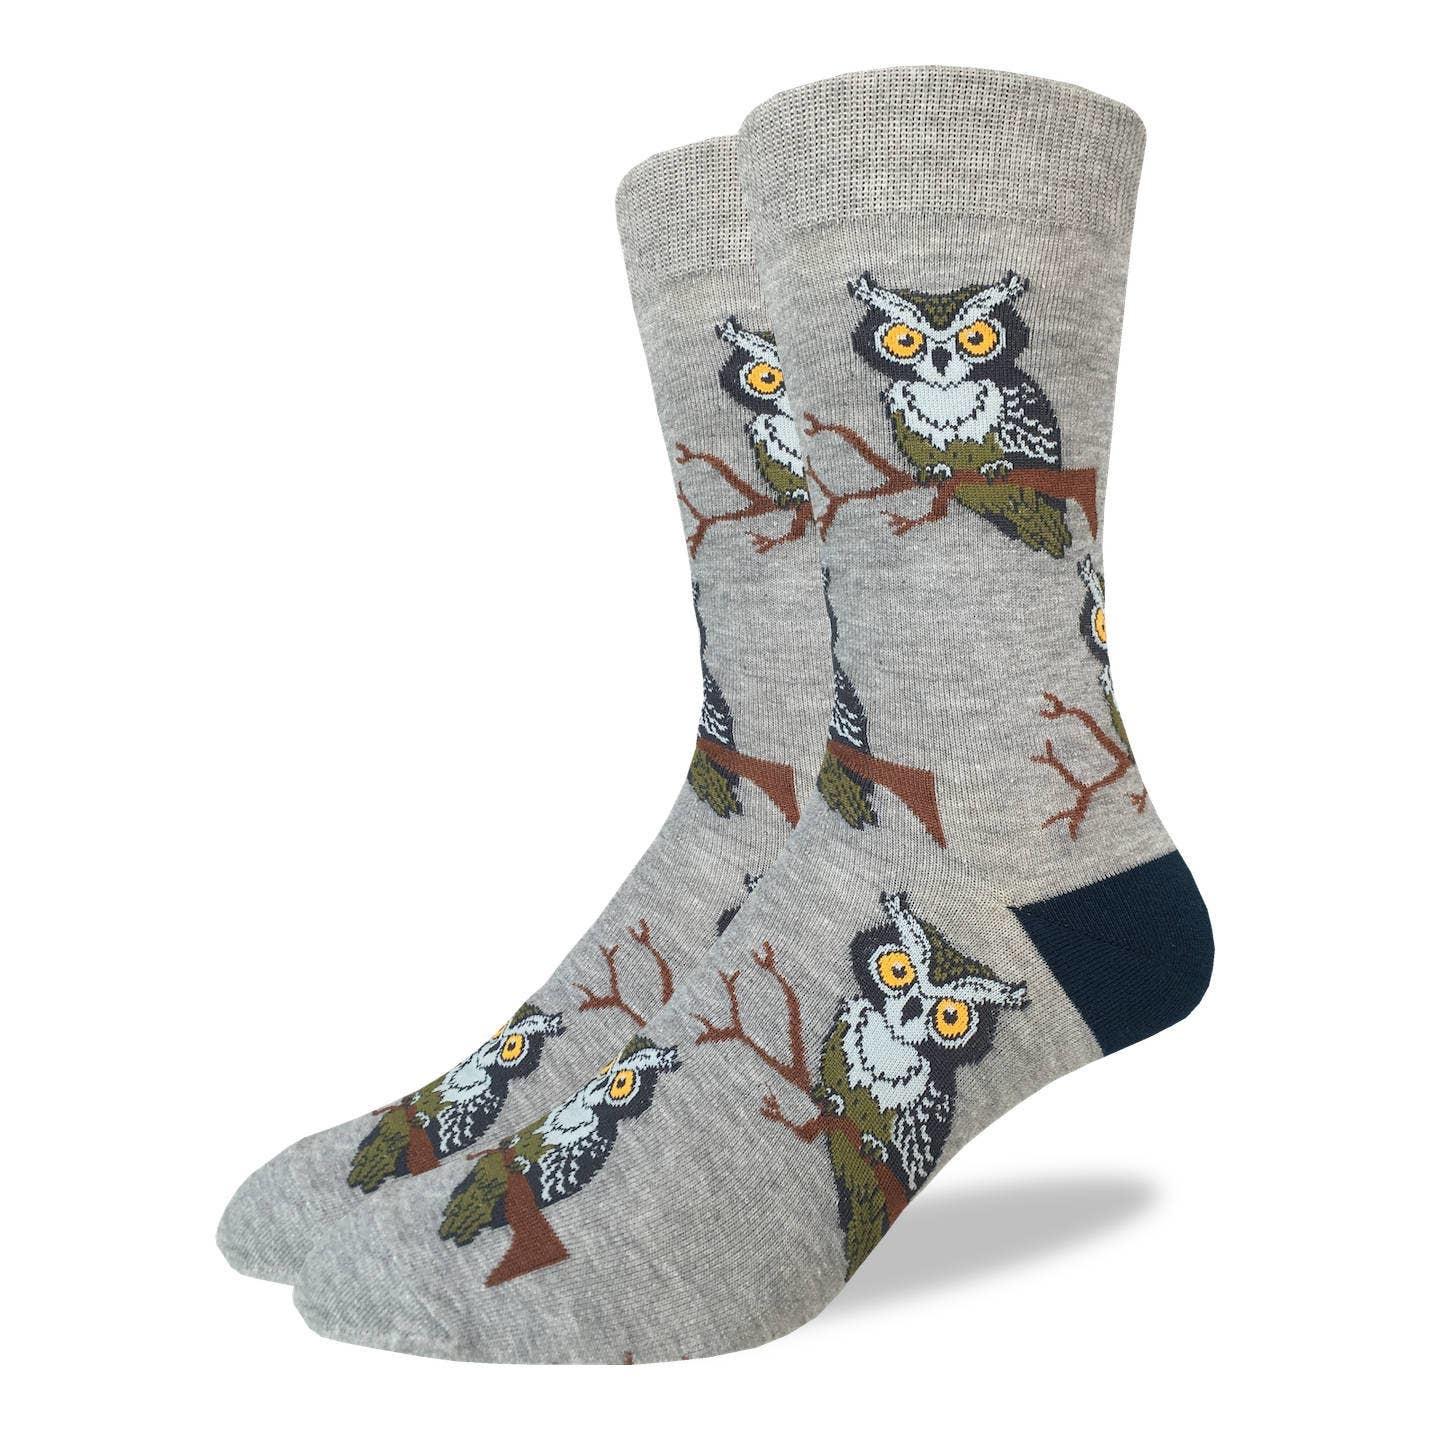 Perching Owl Men's Crew Socks